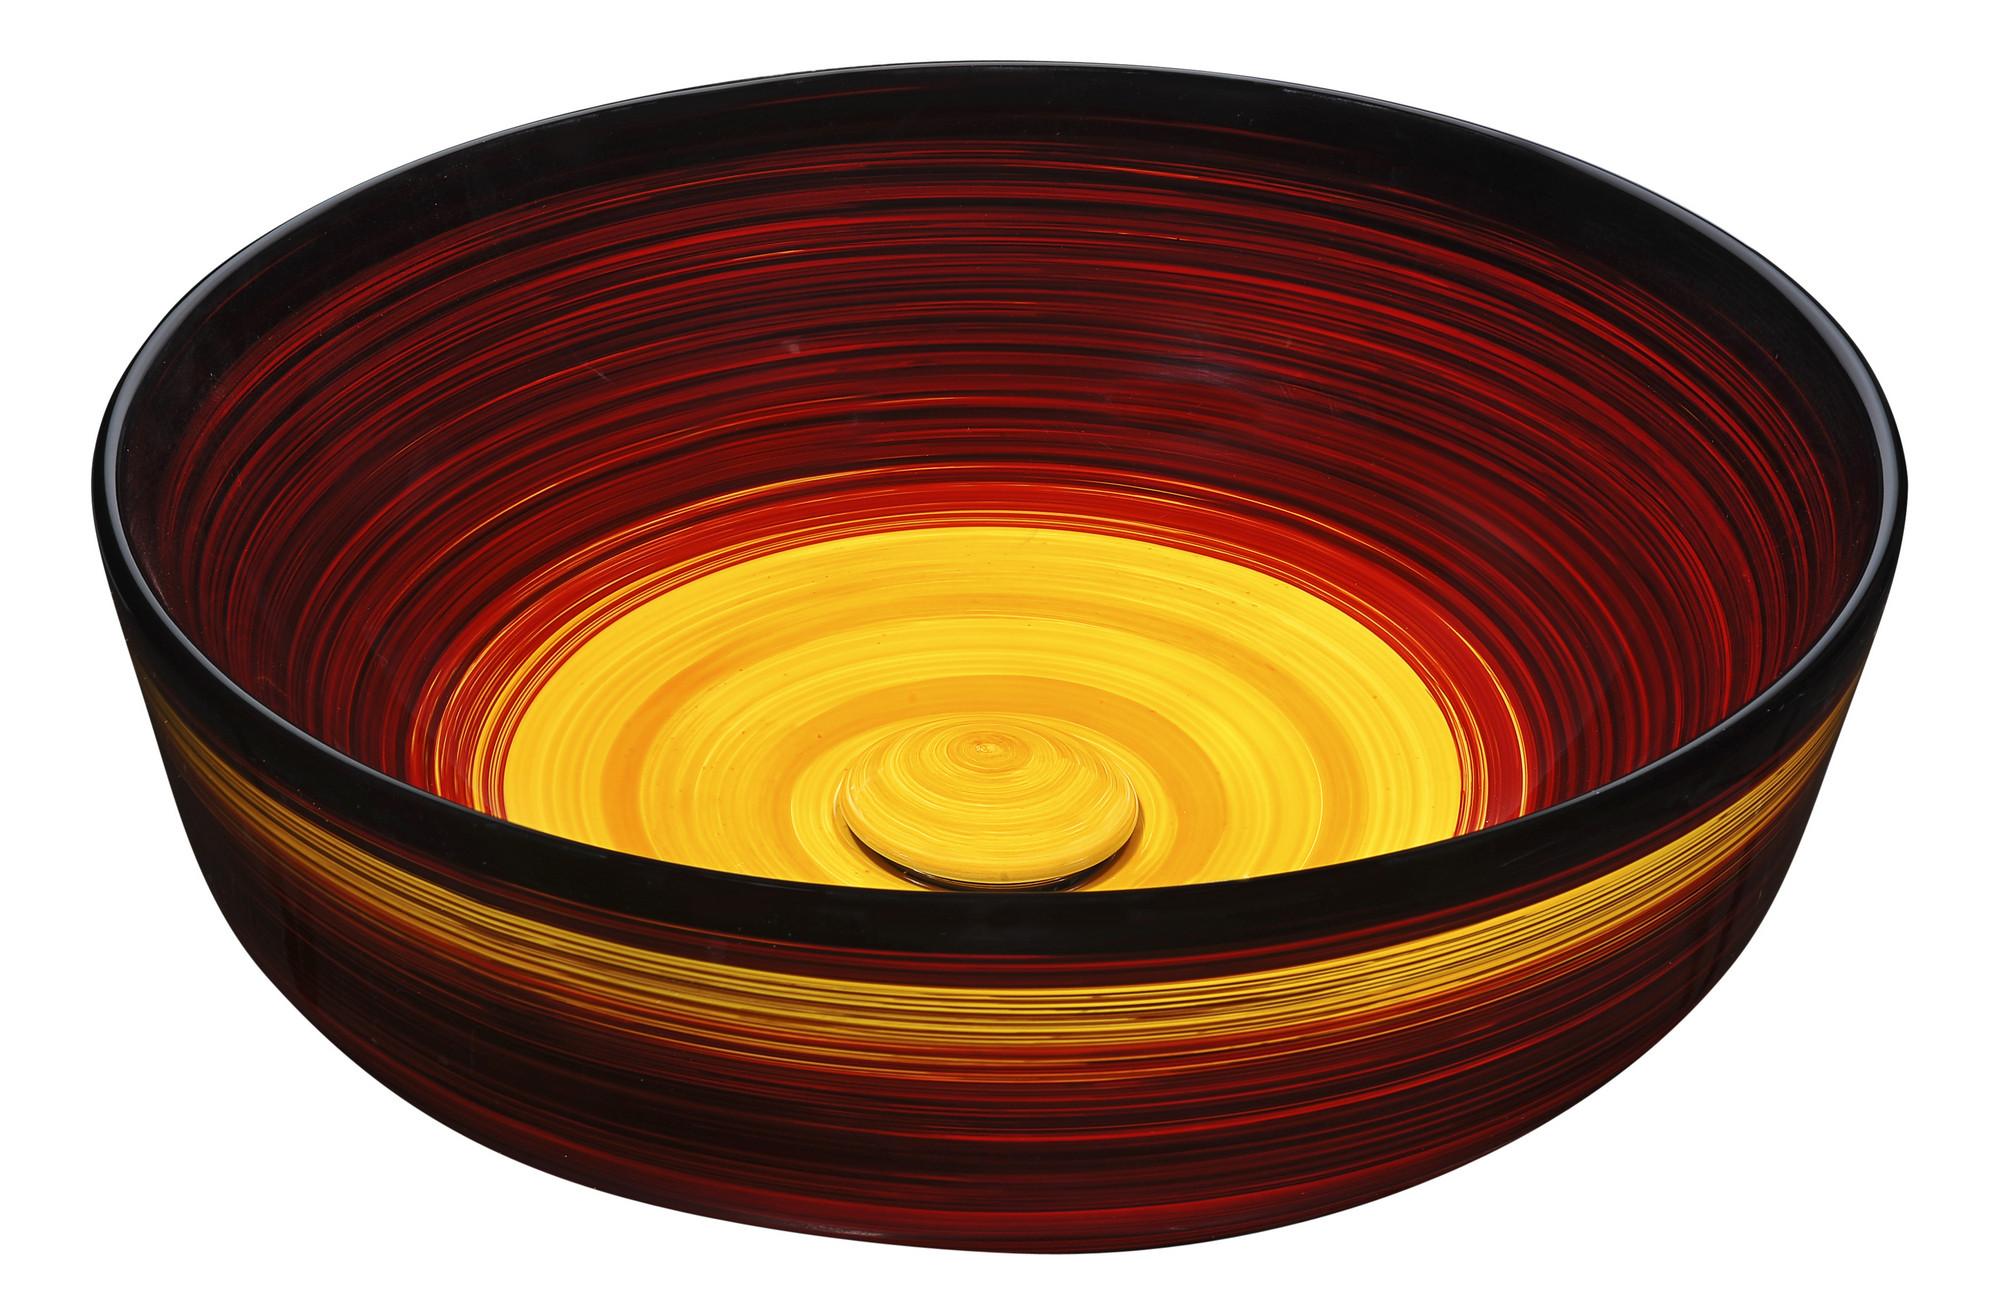 ANZZI LS-AZ231 Dusk Crown Series Ceramic Vessel Sink In Rising Blur Finish